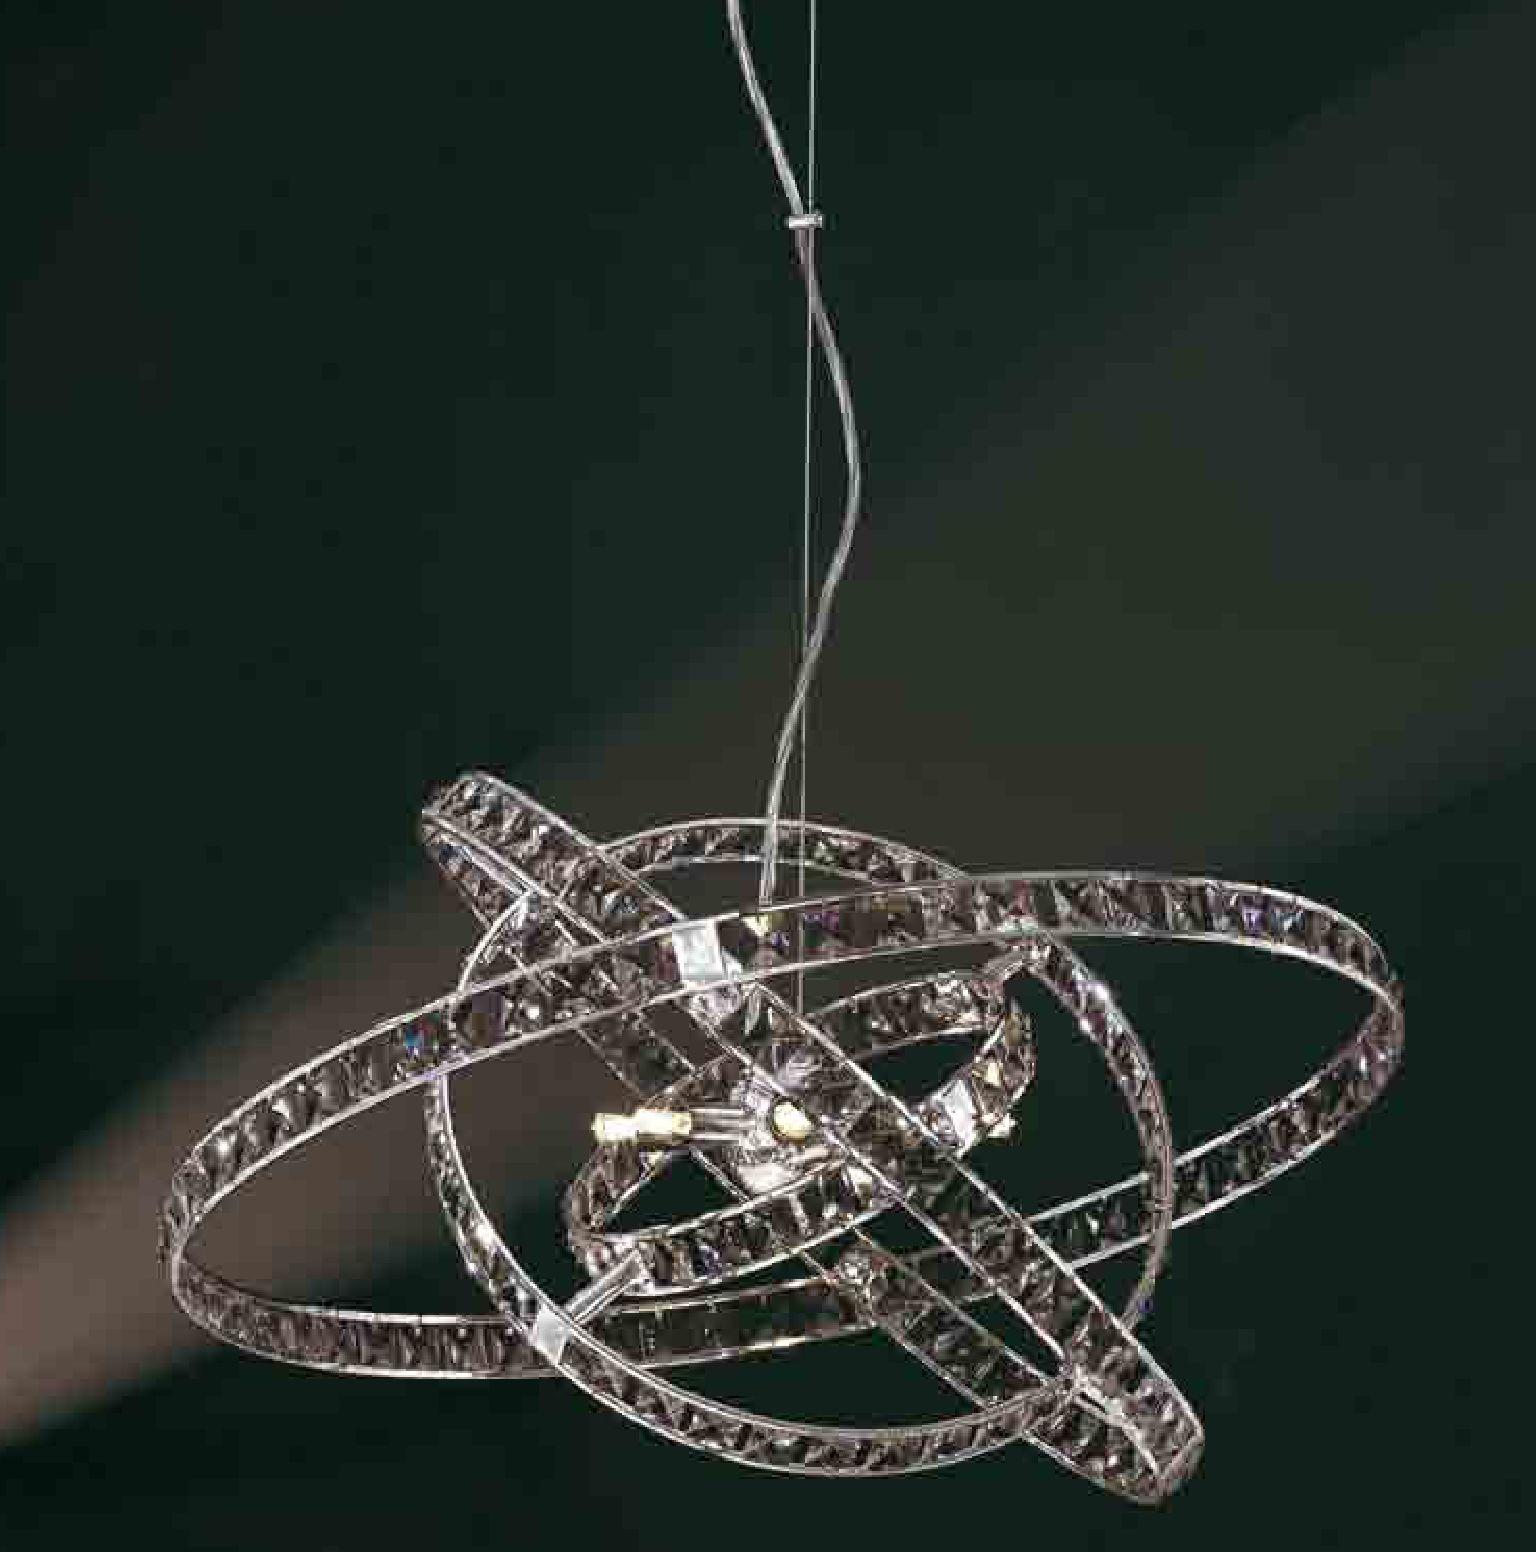 fabbrica lampadari : Lucicastiglione fabbrica lampadari: Nuovo catalogo lampadari moderni